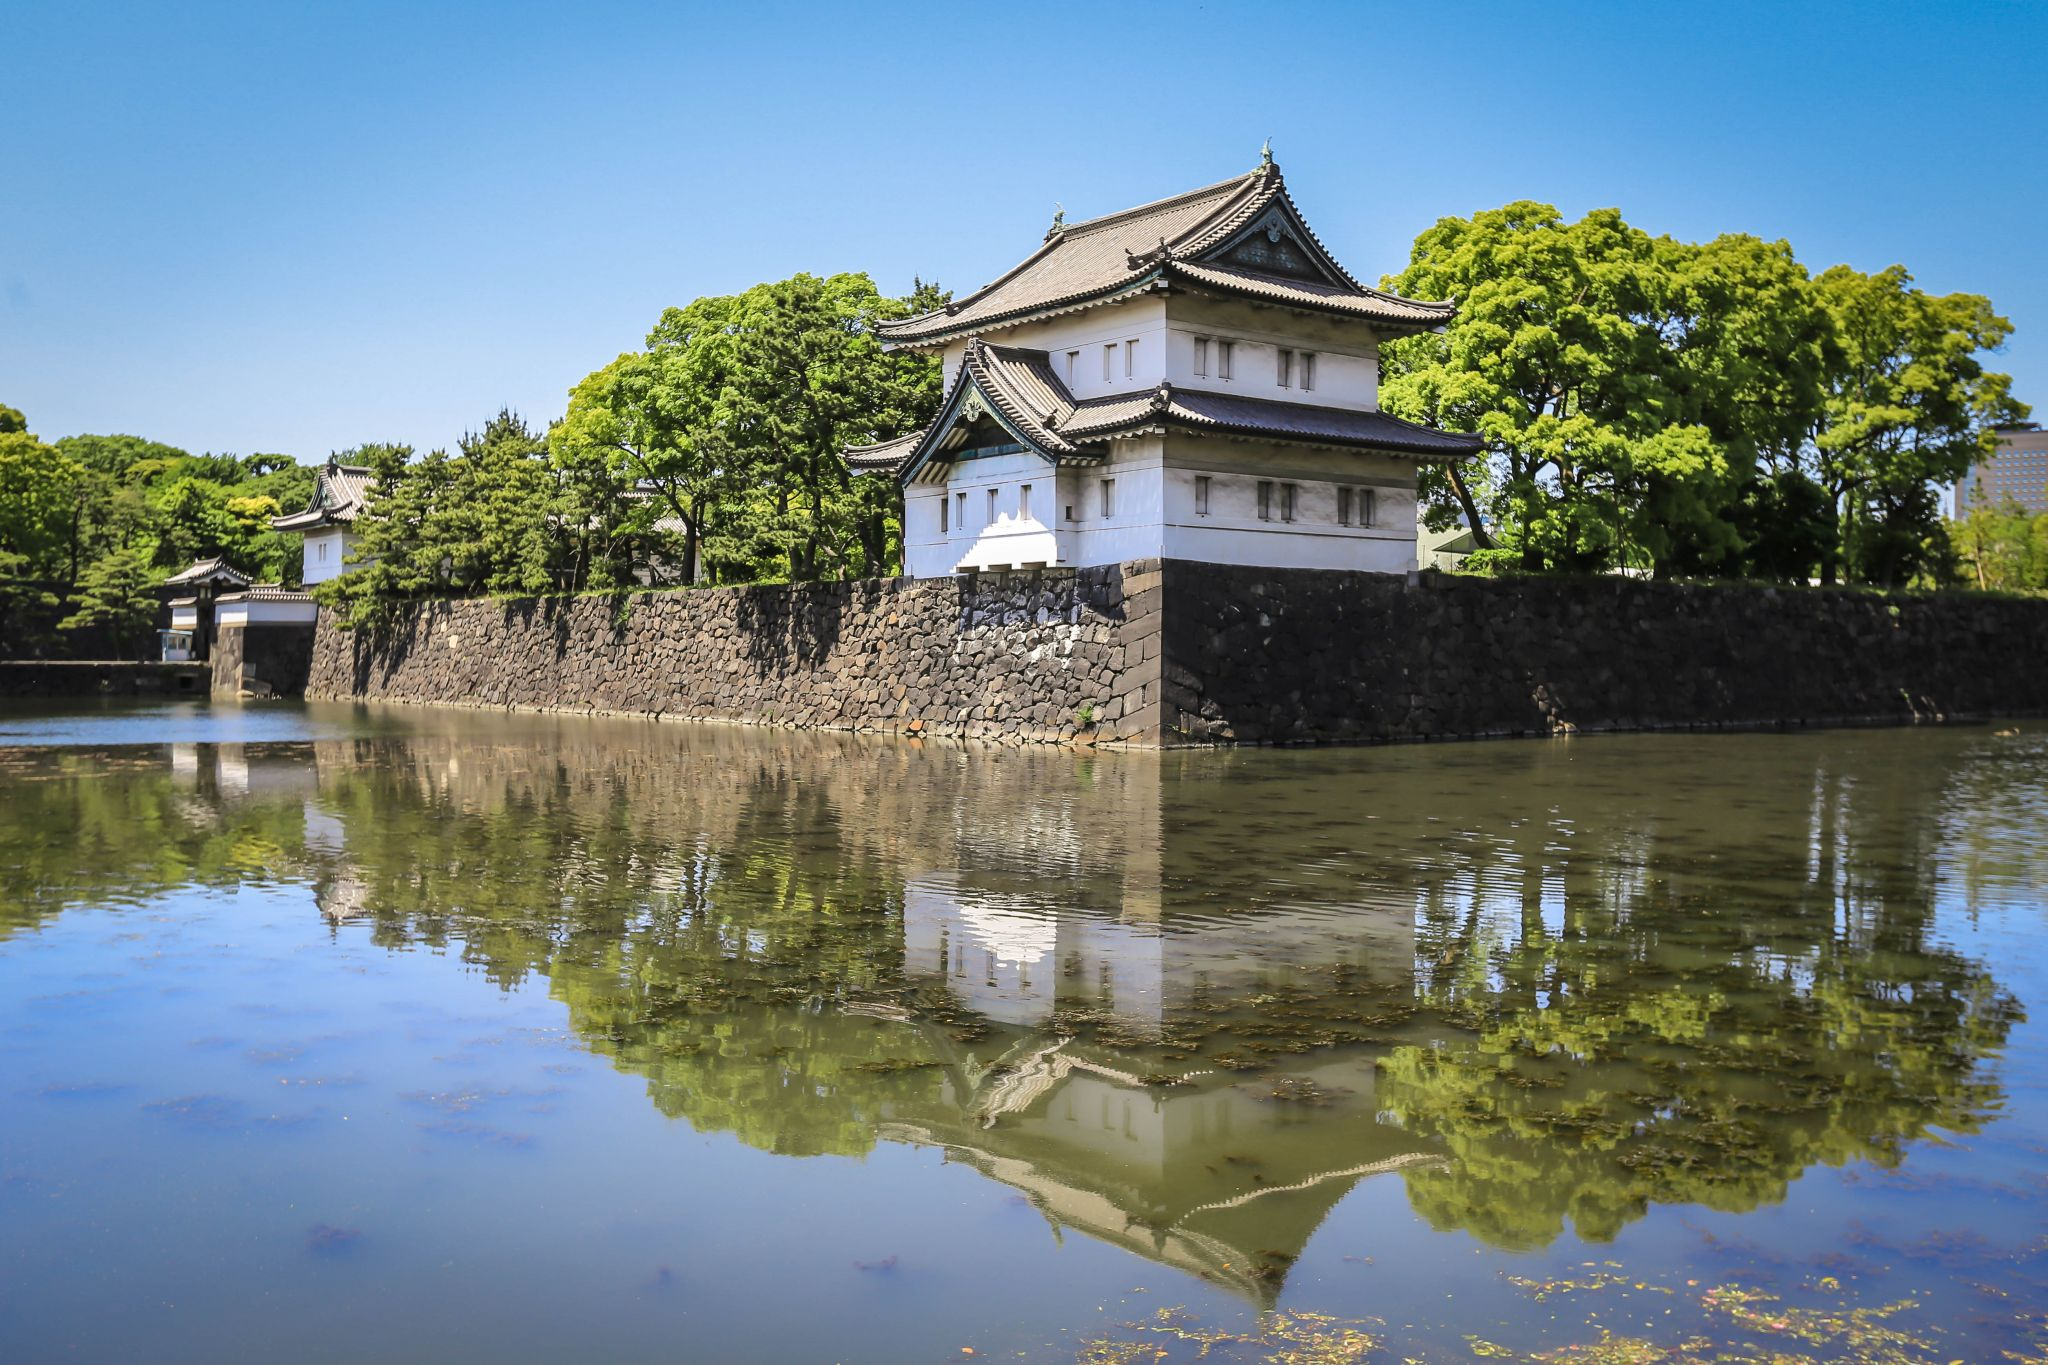 Corner Tower and Kikyo-mon Gate, Japan